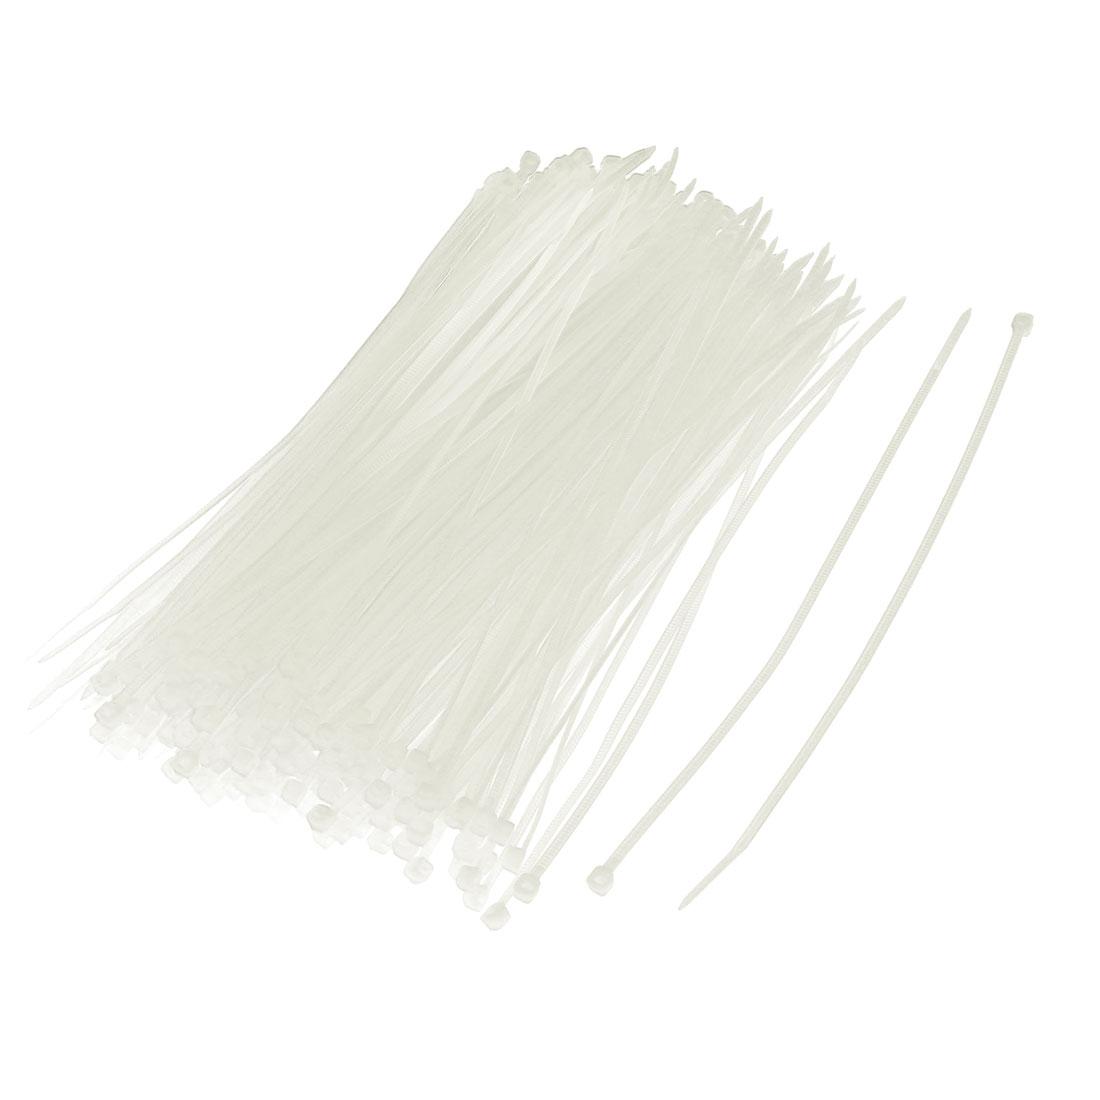 Nylon Self Lock Cable Organizer Fastener String Tie Off White 3 x 200mm 200pcs